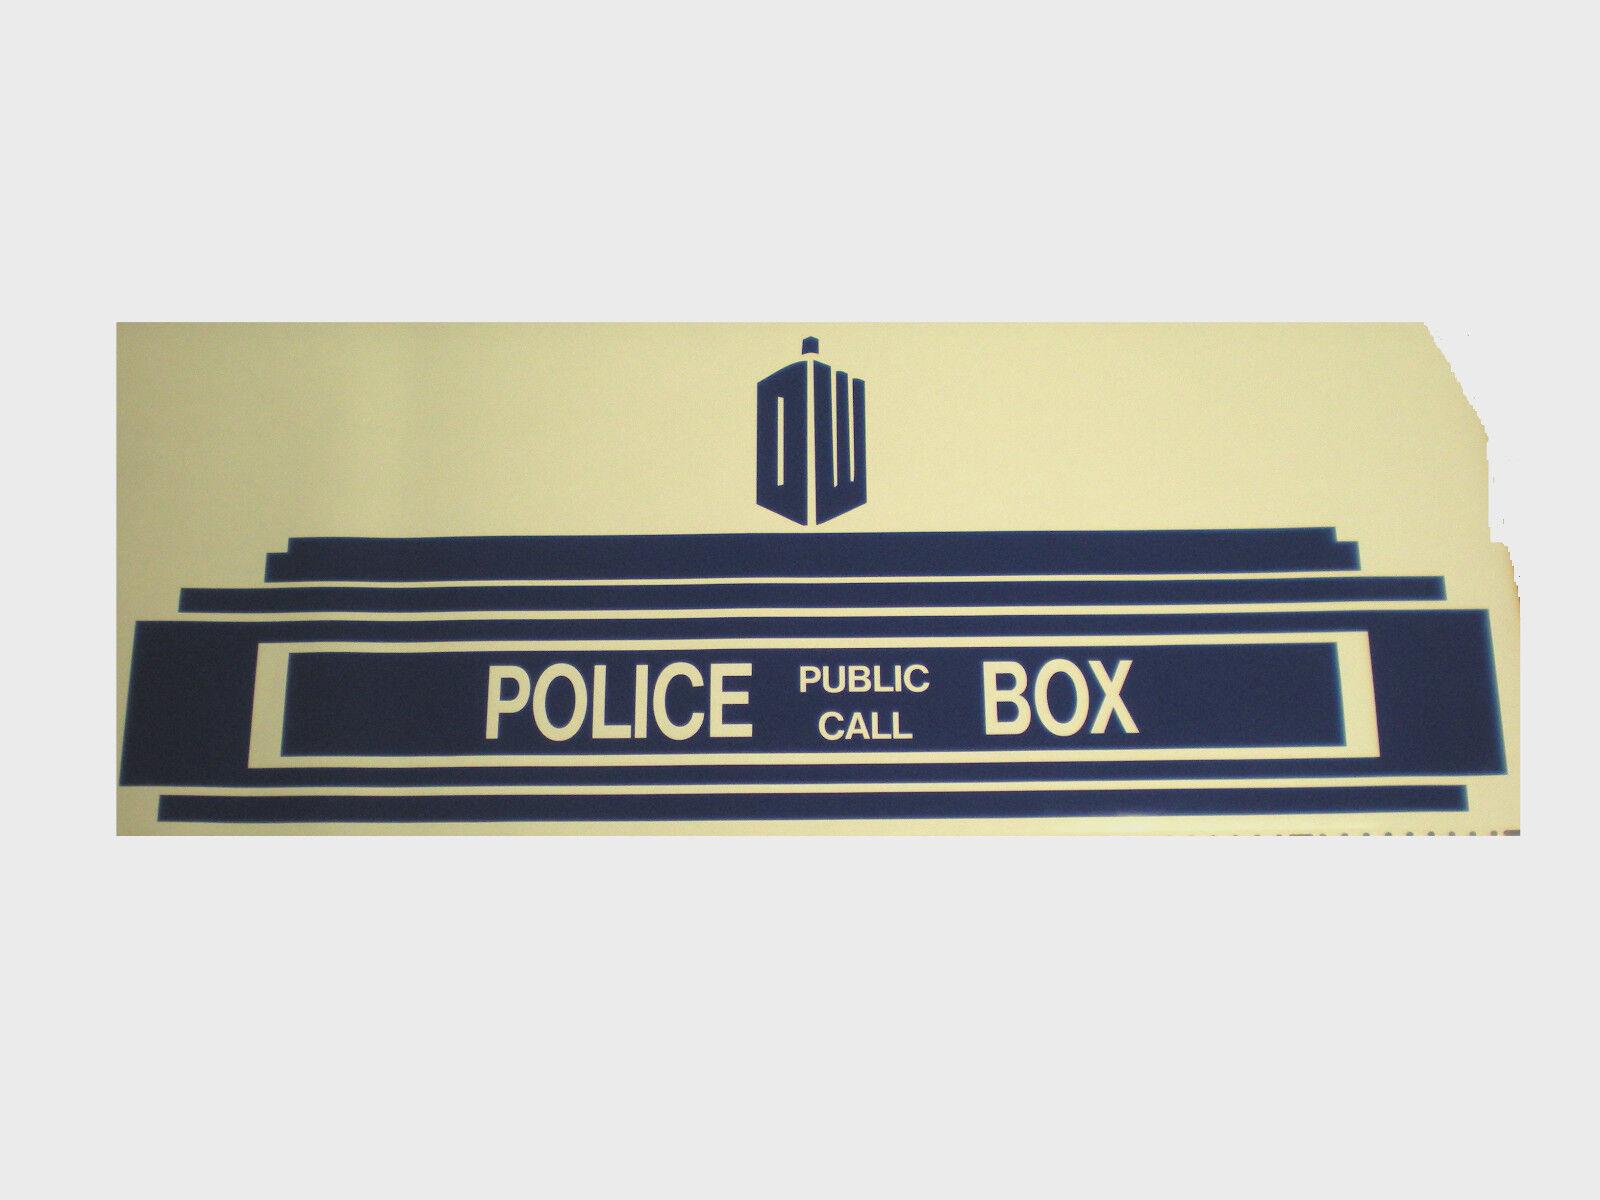 good looking doctor who tardis door decal. Picture 1 of Tardis Door Decal Doctor Who Style Sticker Kids Room Wall Decor 32